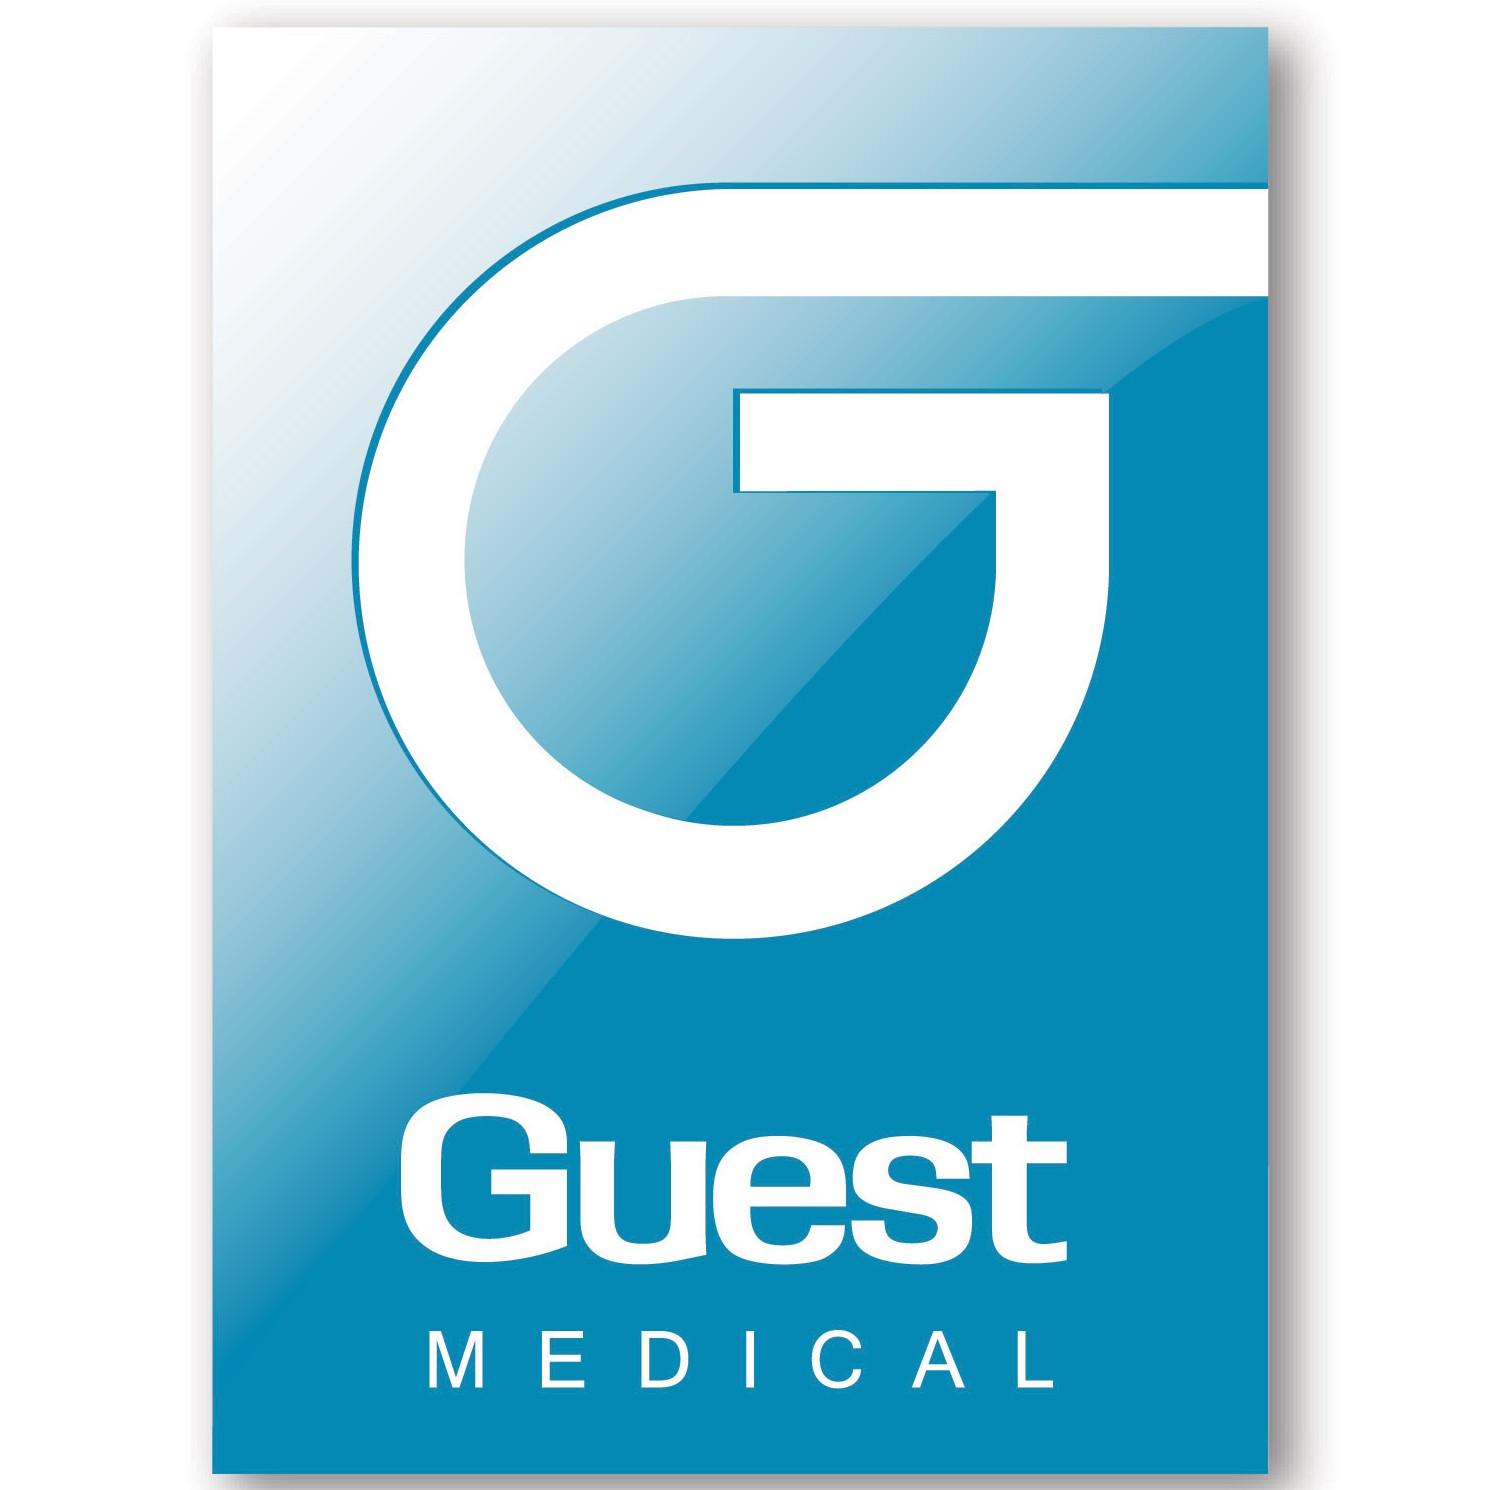 GUEST MEDICAL